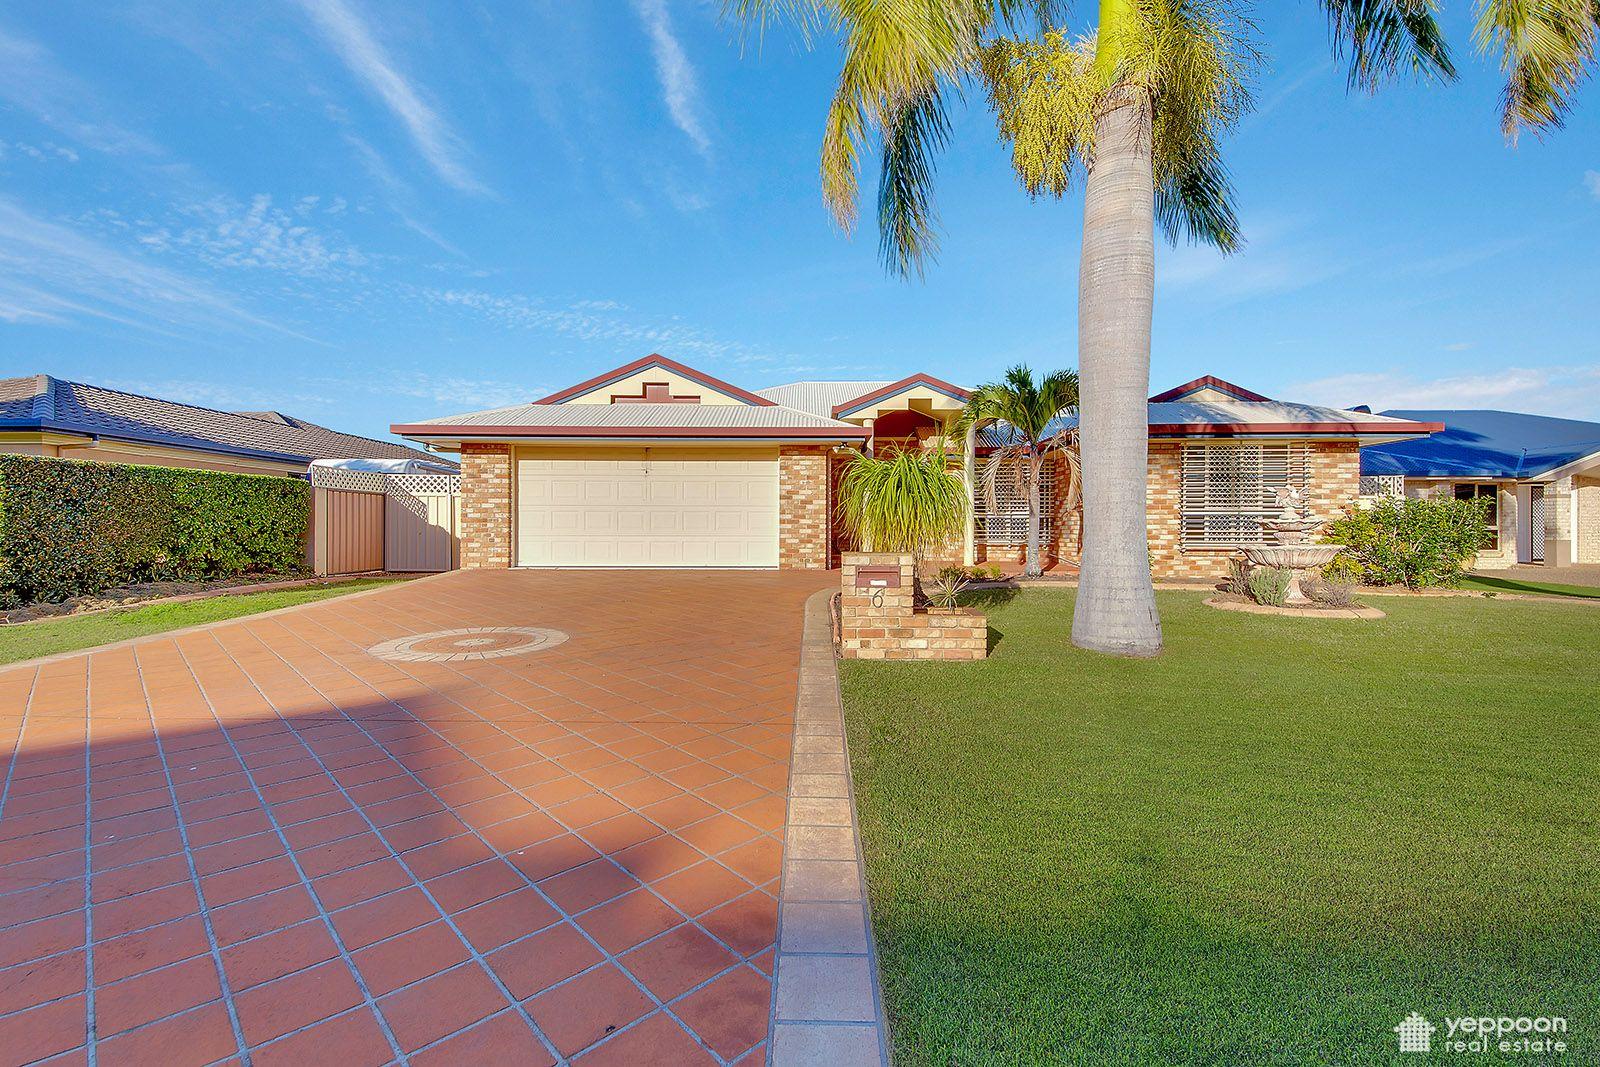 6 Tasman Crescent, Yeppoon QLD 4703, Image 0